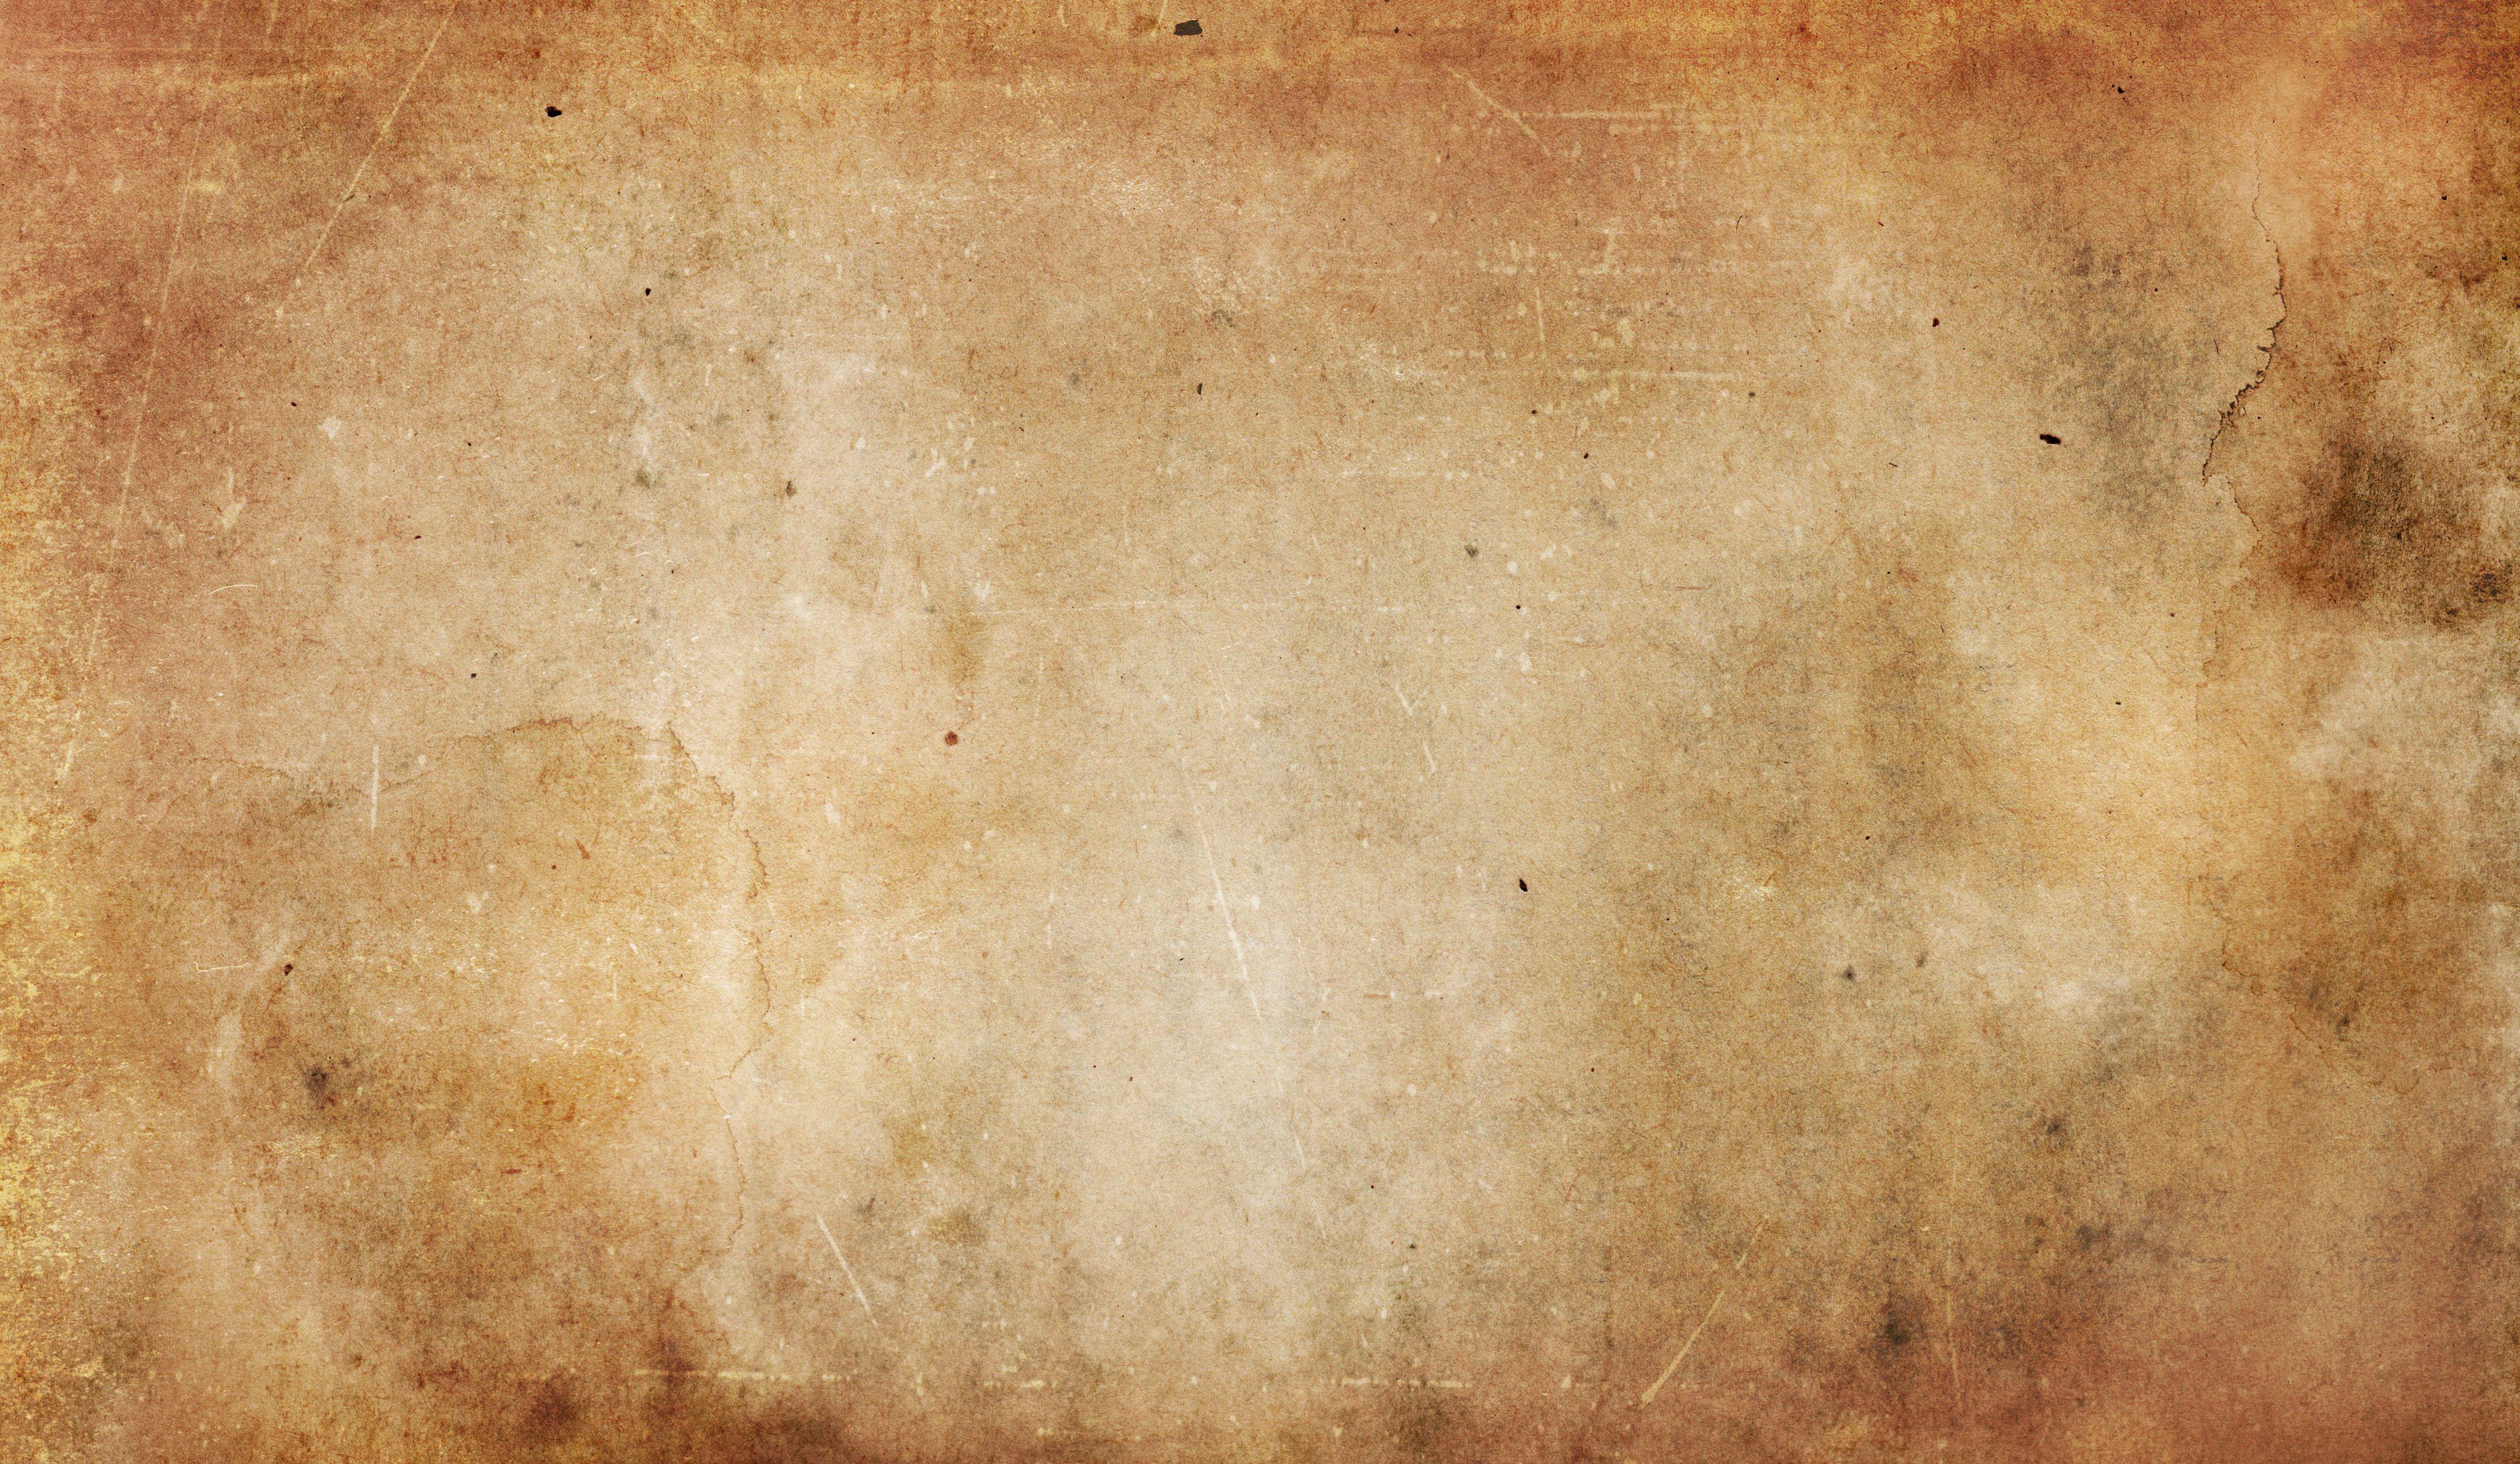 paper texture by empessah on DeviantArt | texture | Pinterest ...